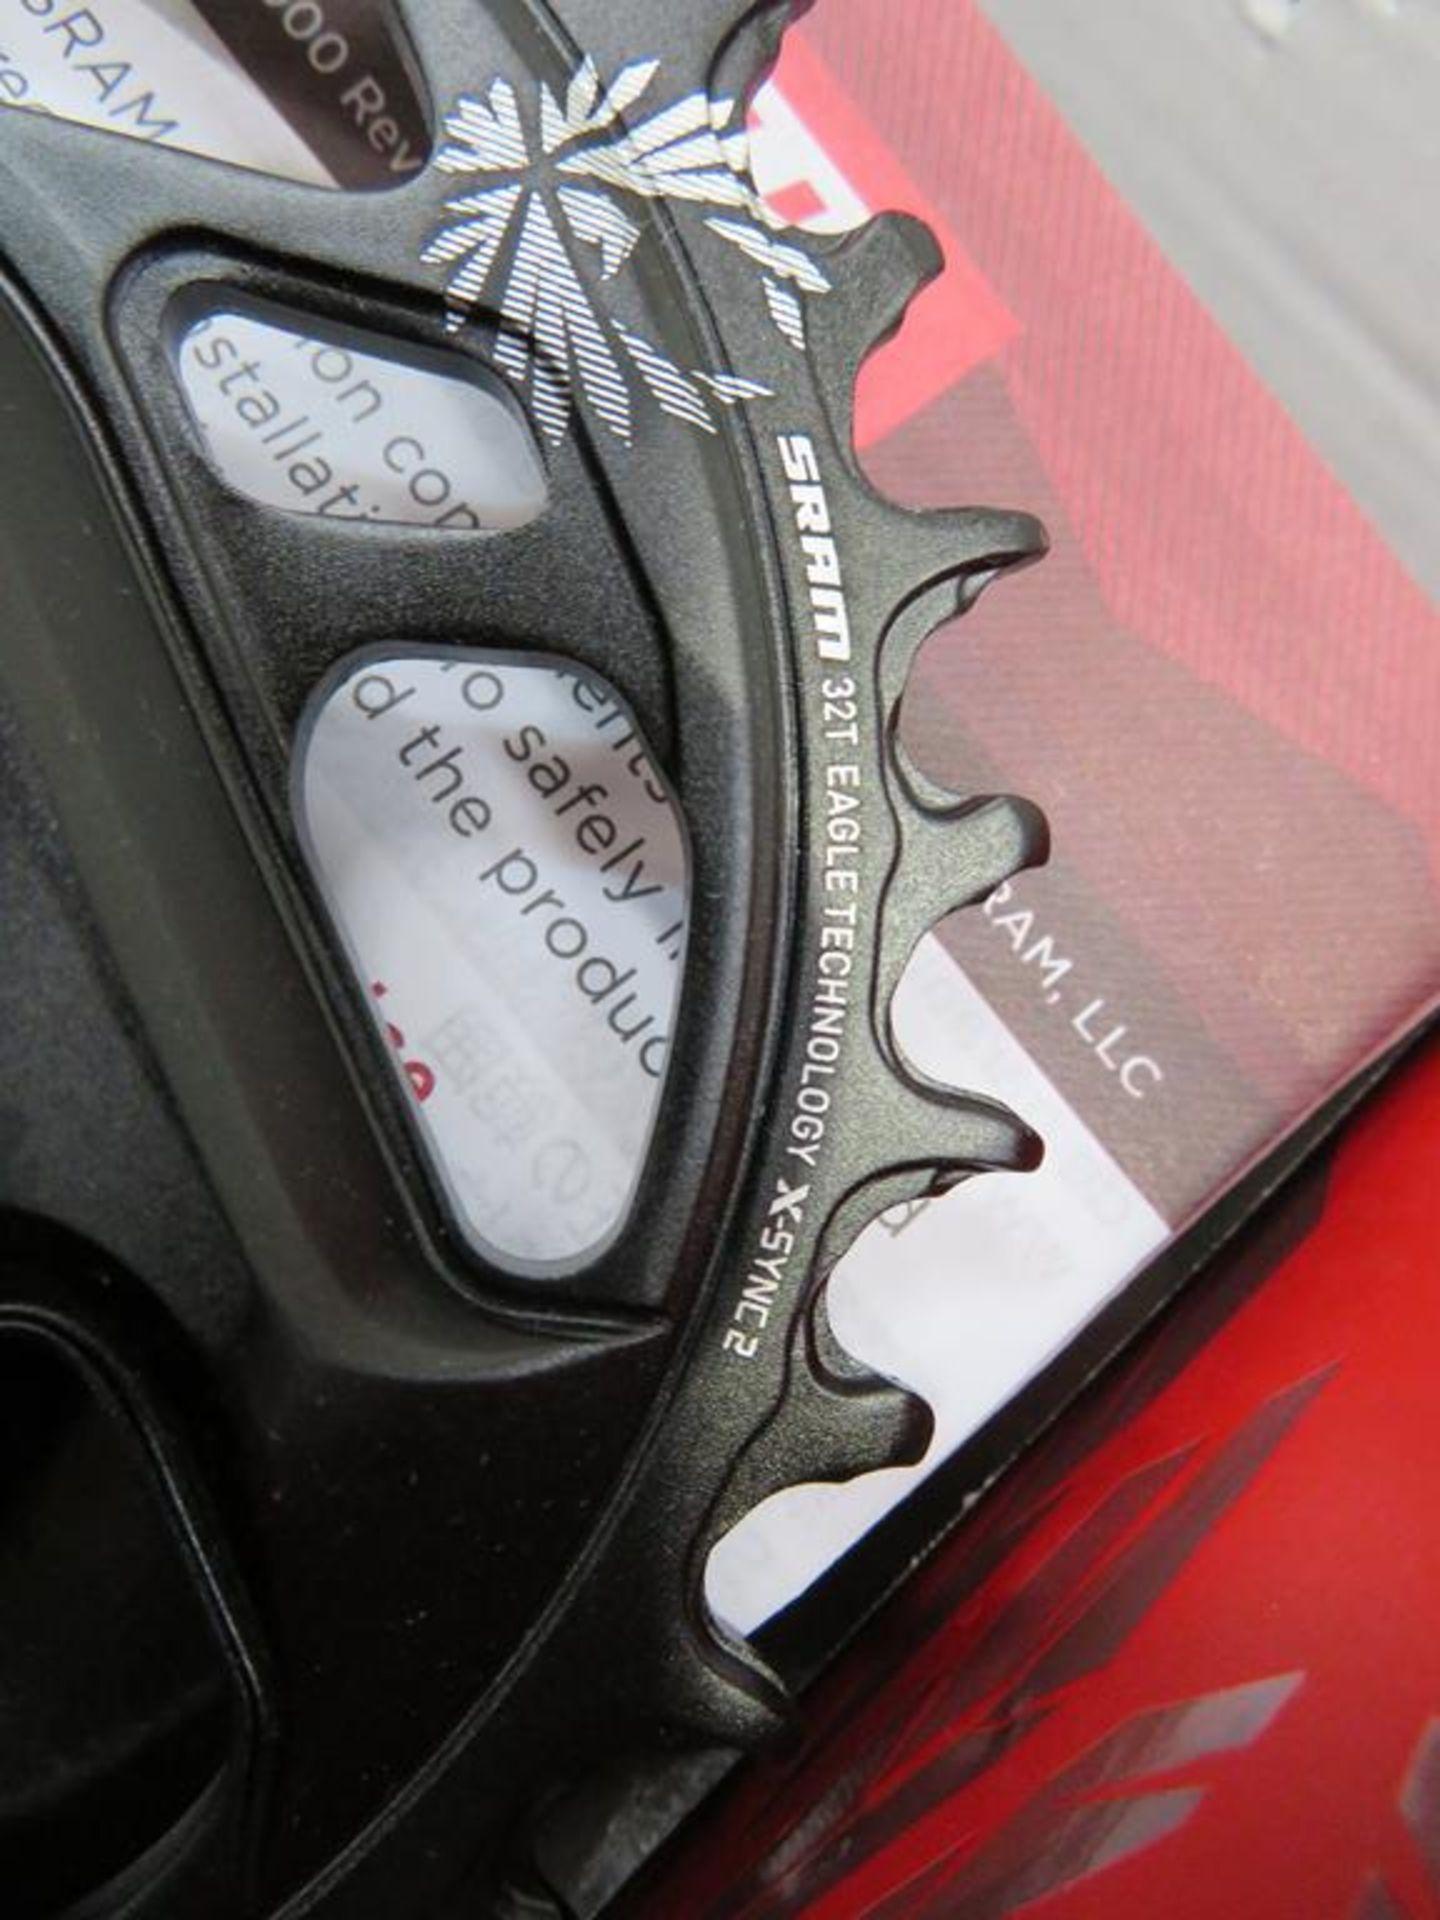 Lot 57 - SRAM Crank GX Direct Mount Chainring